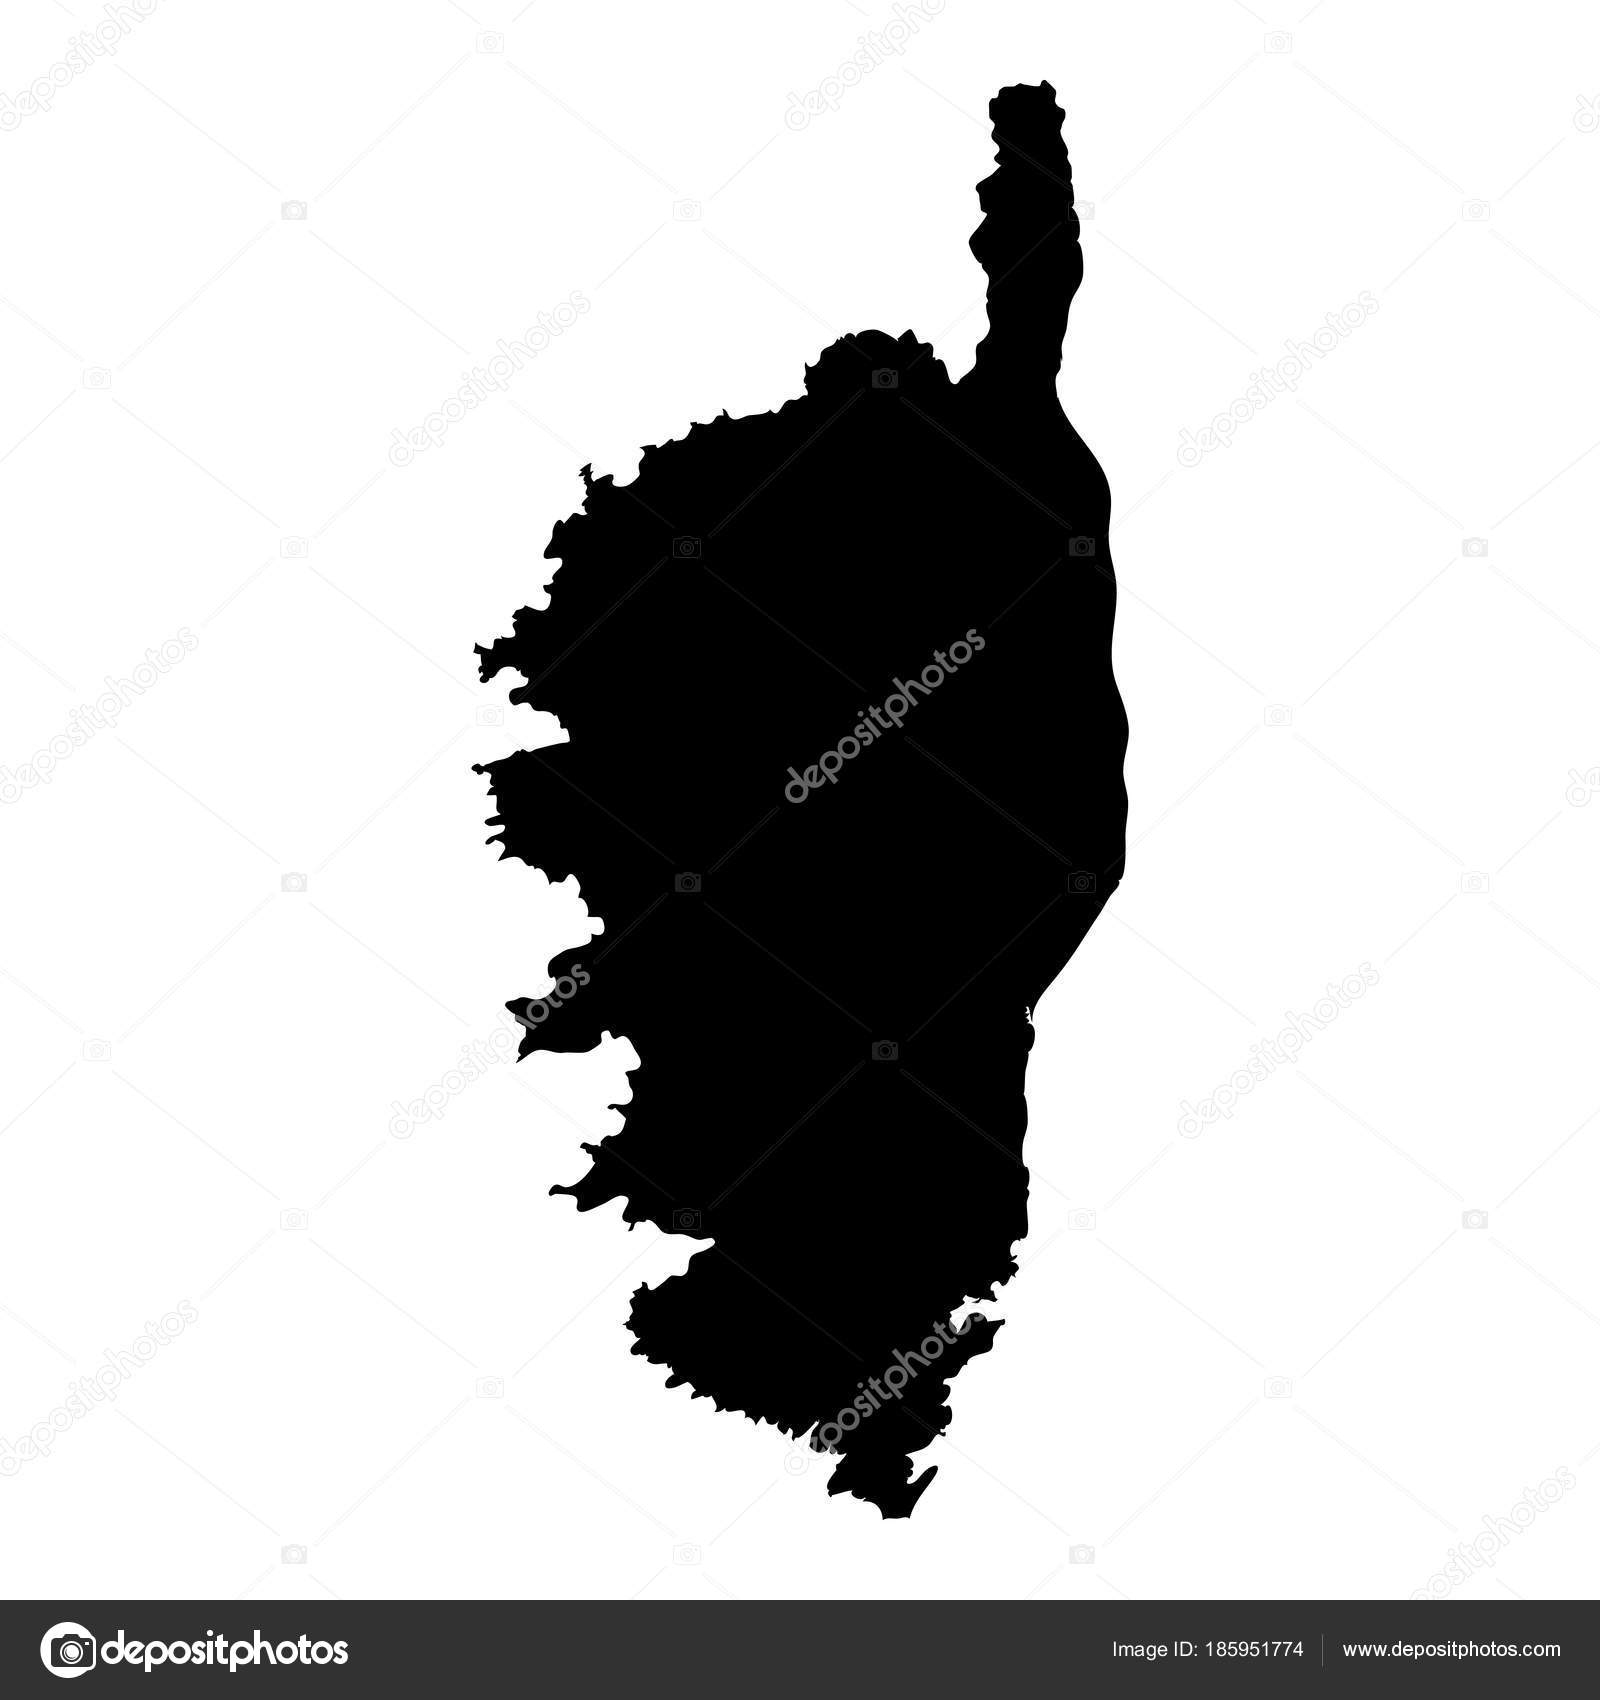 Carte Corse Noir Et Blanc.Carte De Corse Ile Silhouette Icone Isole Corse Carte Noir